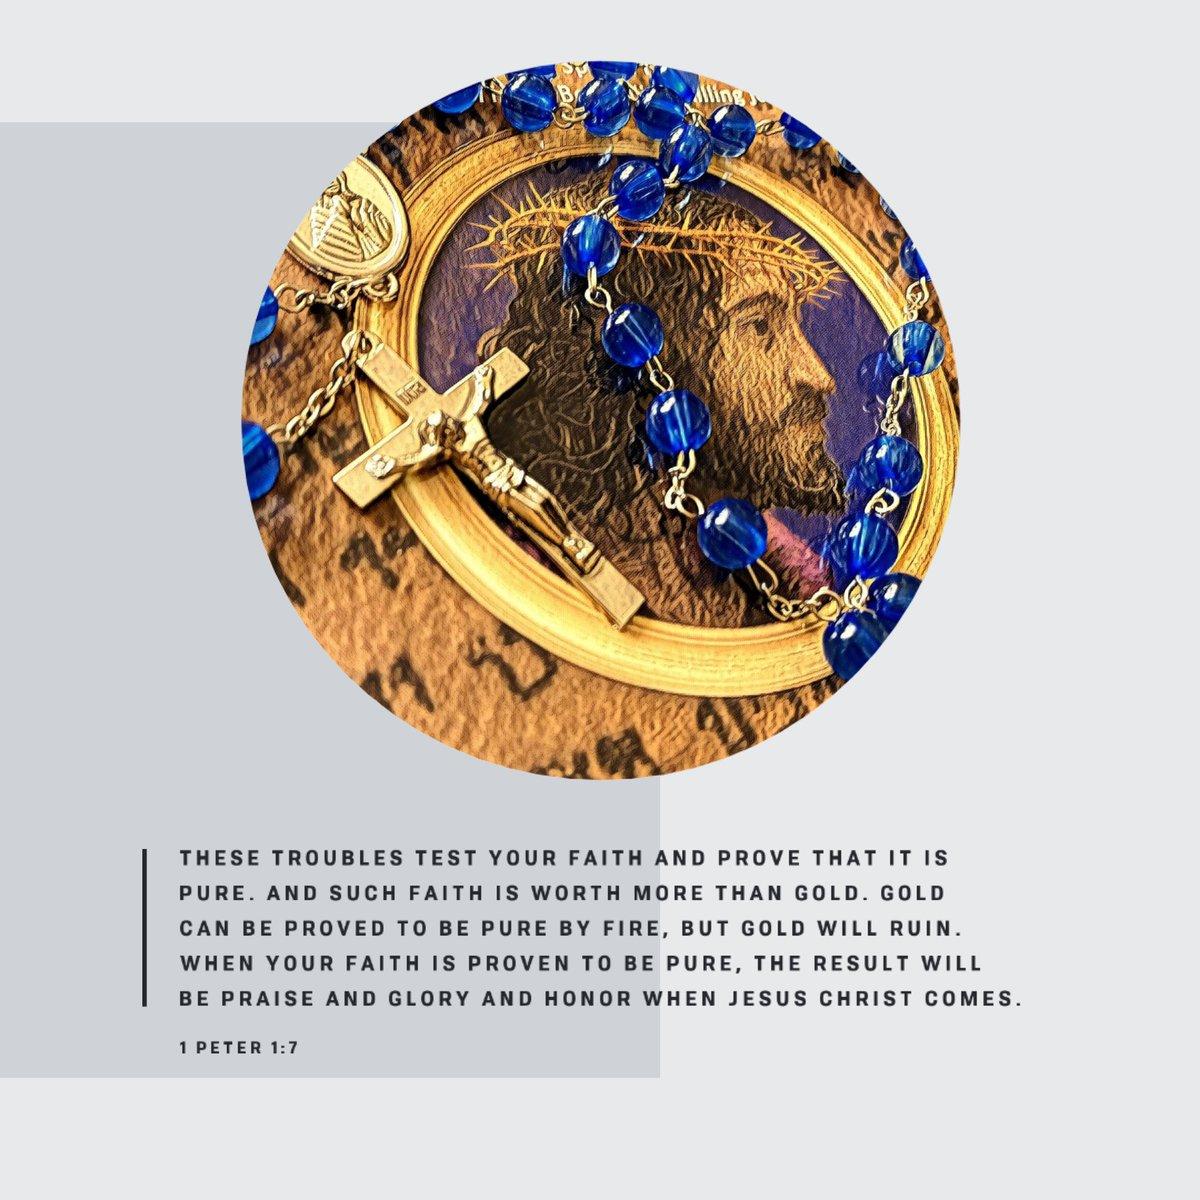 Lord I pray for your forgiveness • 🙏🏻🌈✝️❤️ #Christ #Jesus #Bible #Biblical #Love #Forgiveness #Christianity #Faith #Scripture #Cross #Gospel #Easter #Christmas #Advent #Lent #GodIsGood #Moses #Noah #NoahsArk #TenCommandments #Believe  #BibleVerse #DailyBibleVerse